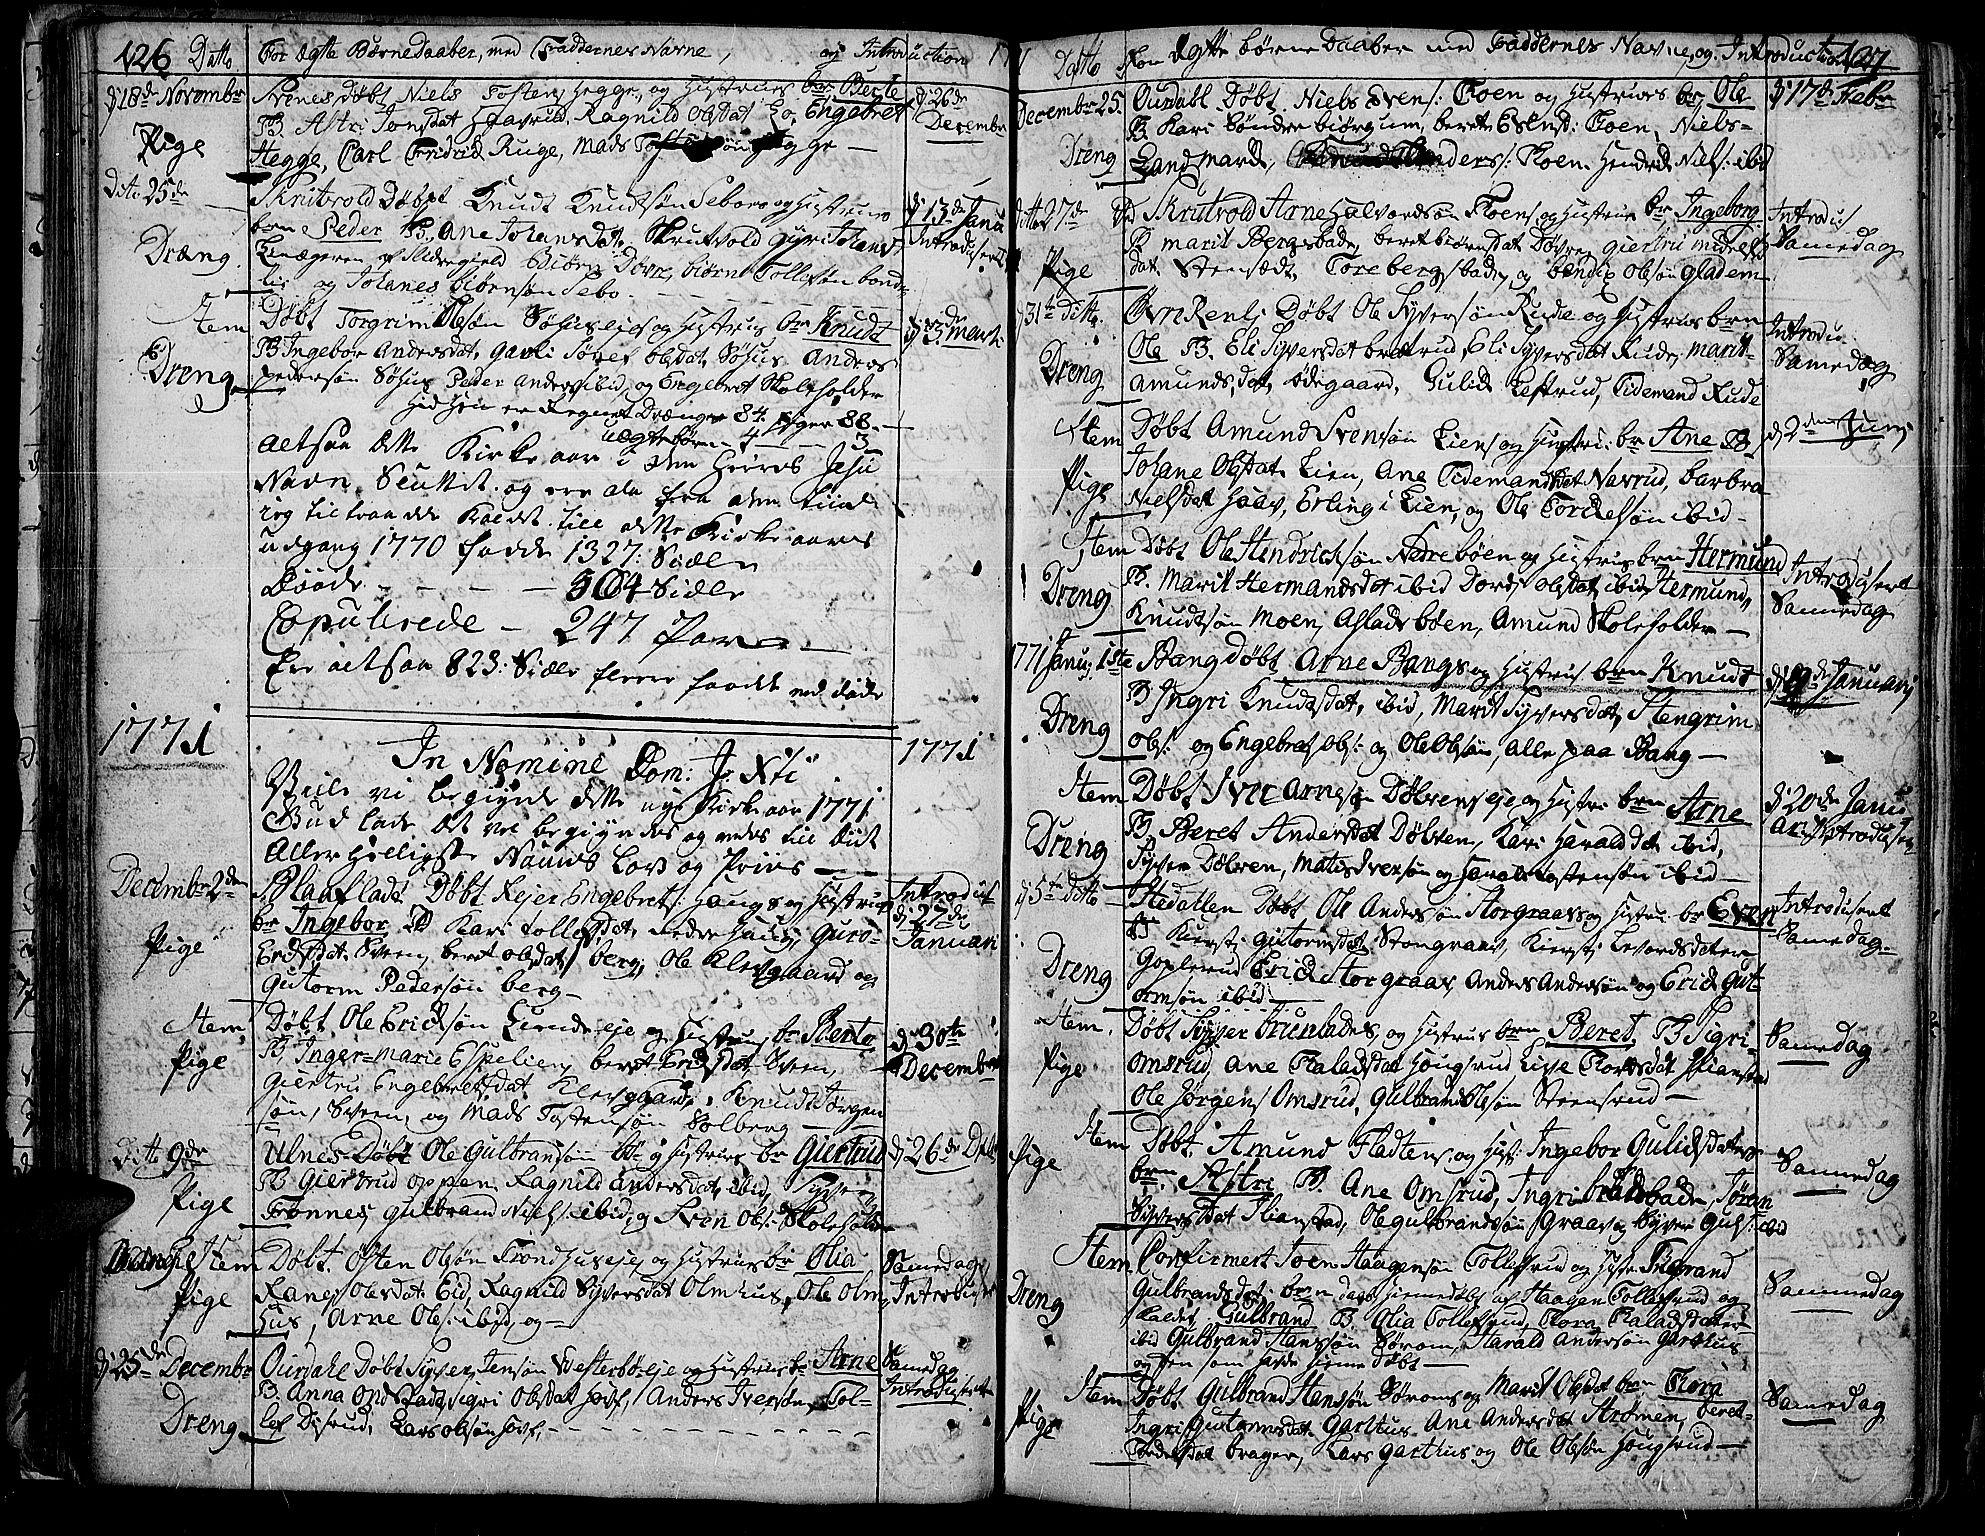 SAH, Aurdal prestekontor, Ministerialbok nr. 5, 1763-1781, s. 126-127